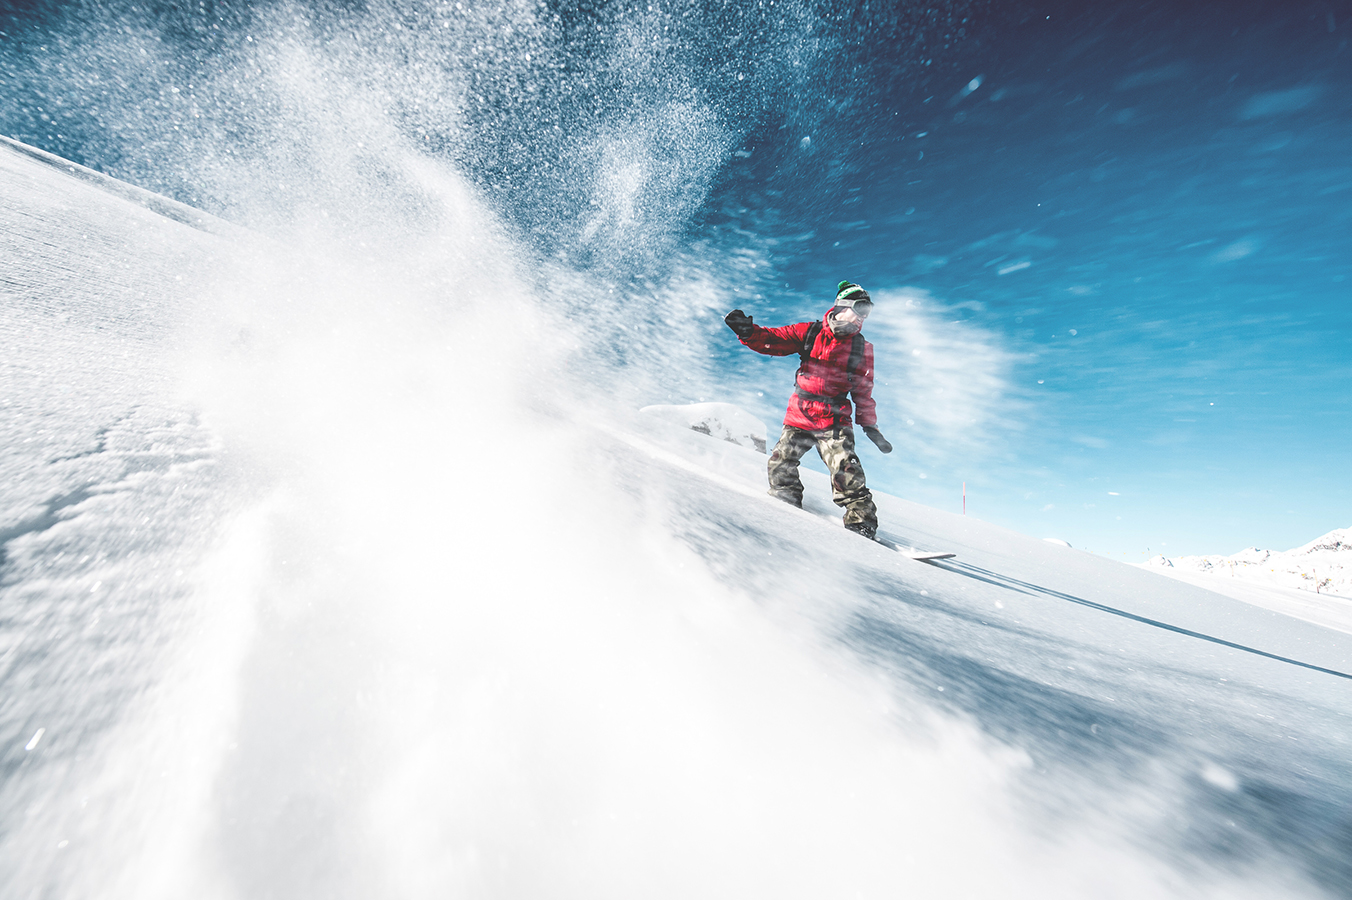 NicolasMüller_Snowboard_StMoritz_SilvanoZeiter_2.jpg